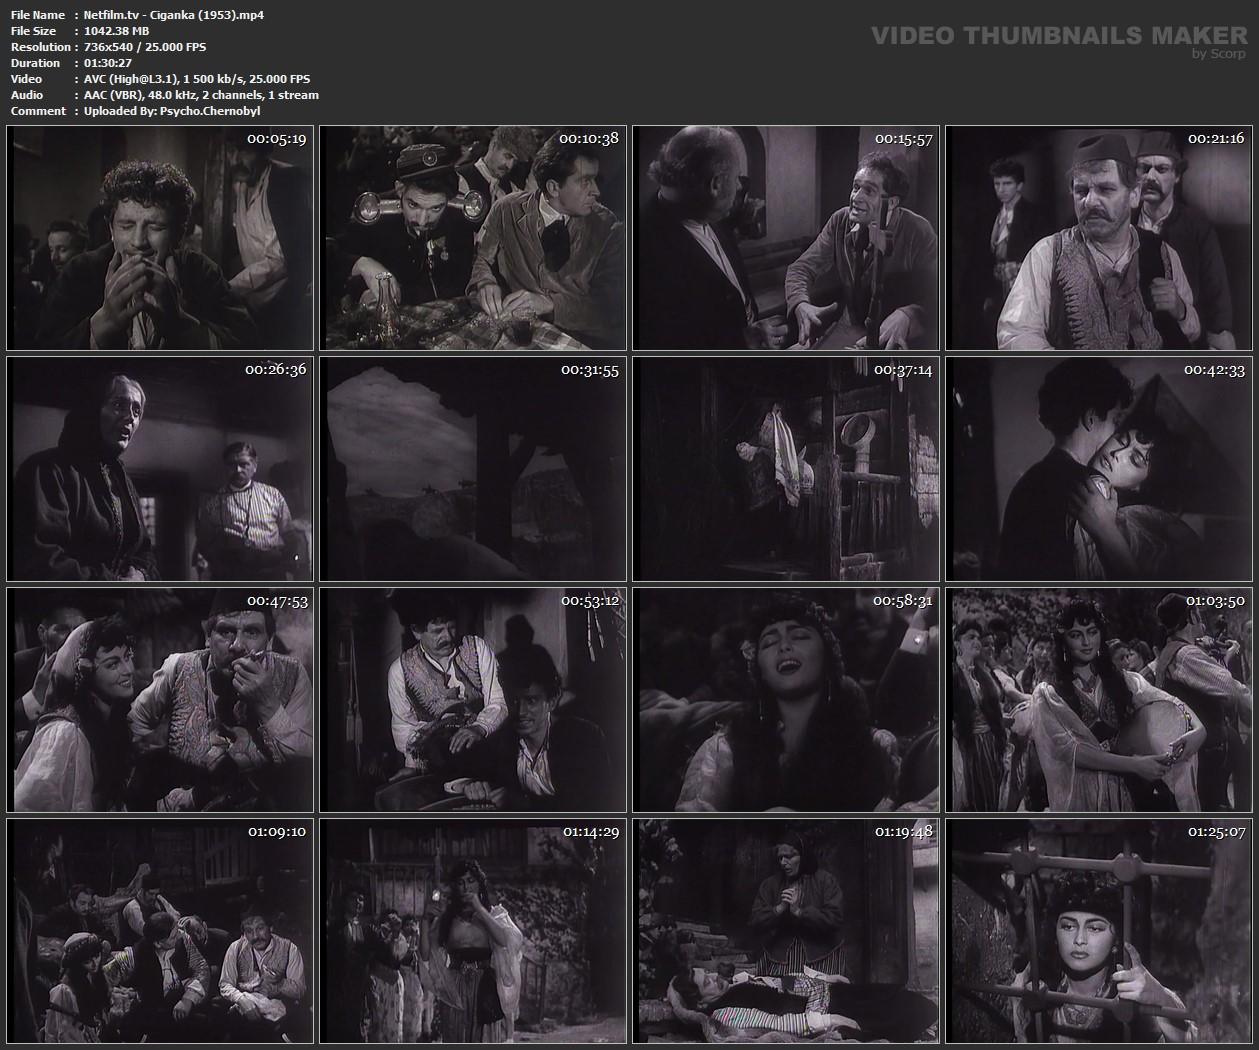 Netfilm-tv-Ciganka-1953-mp4.jpg